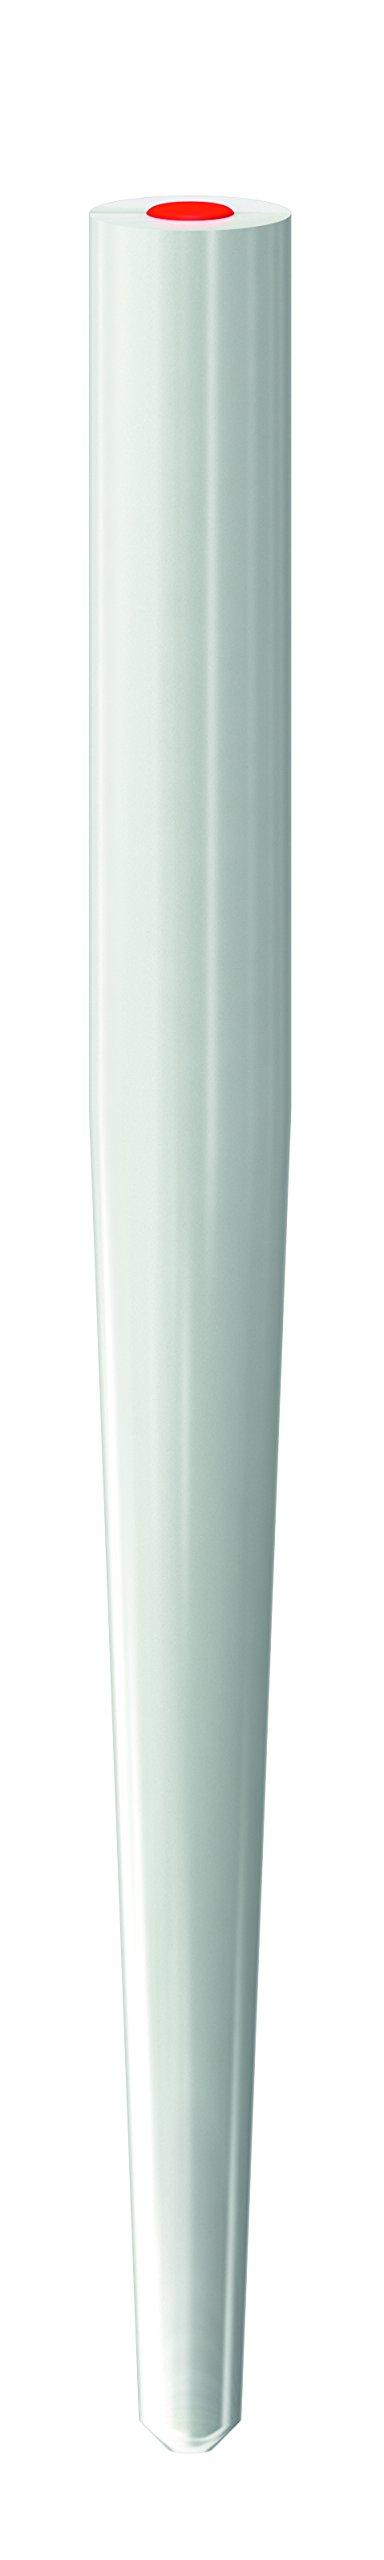 Komet USA 232L12.090 C-Post (Pack of 5)